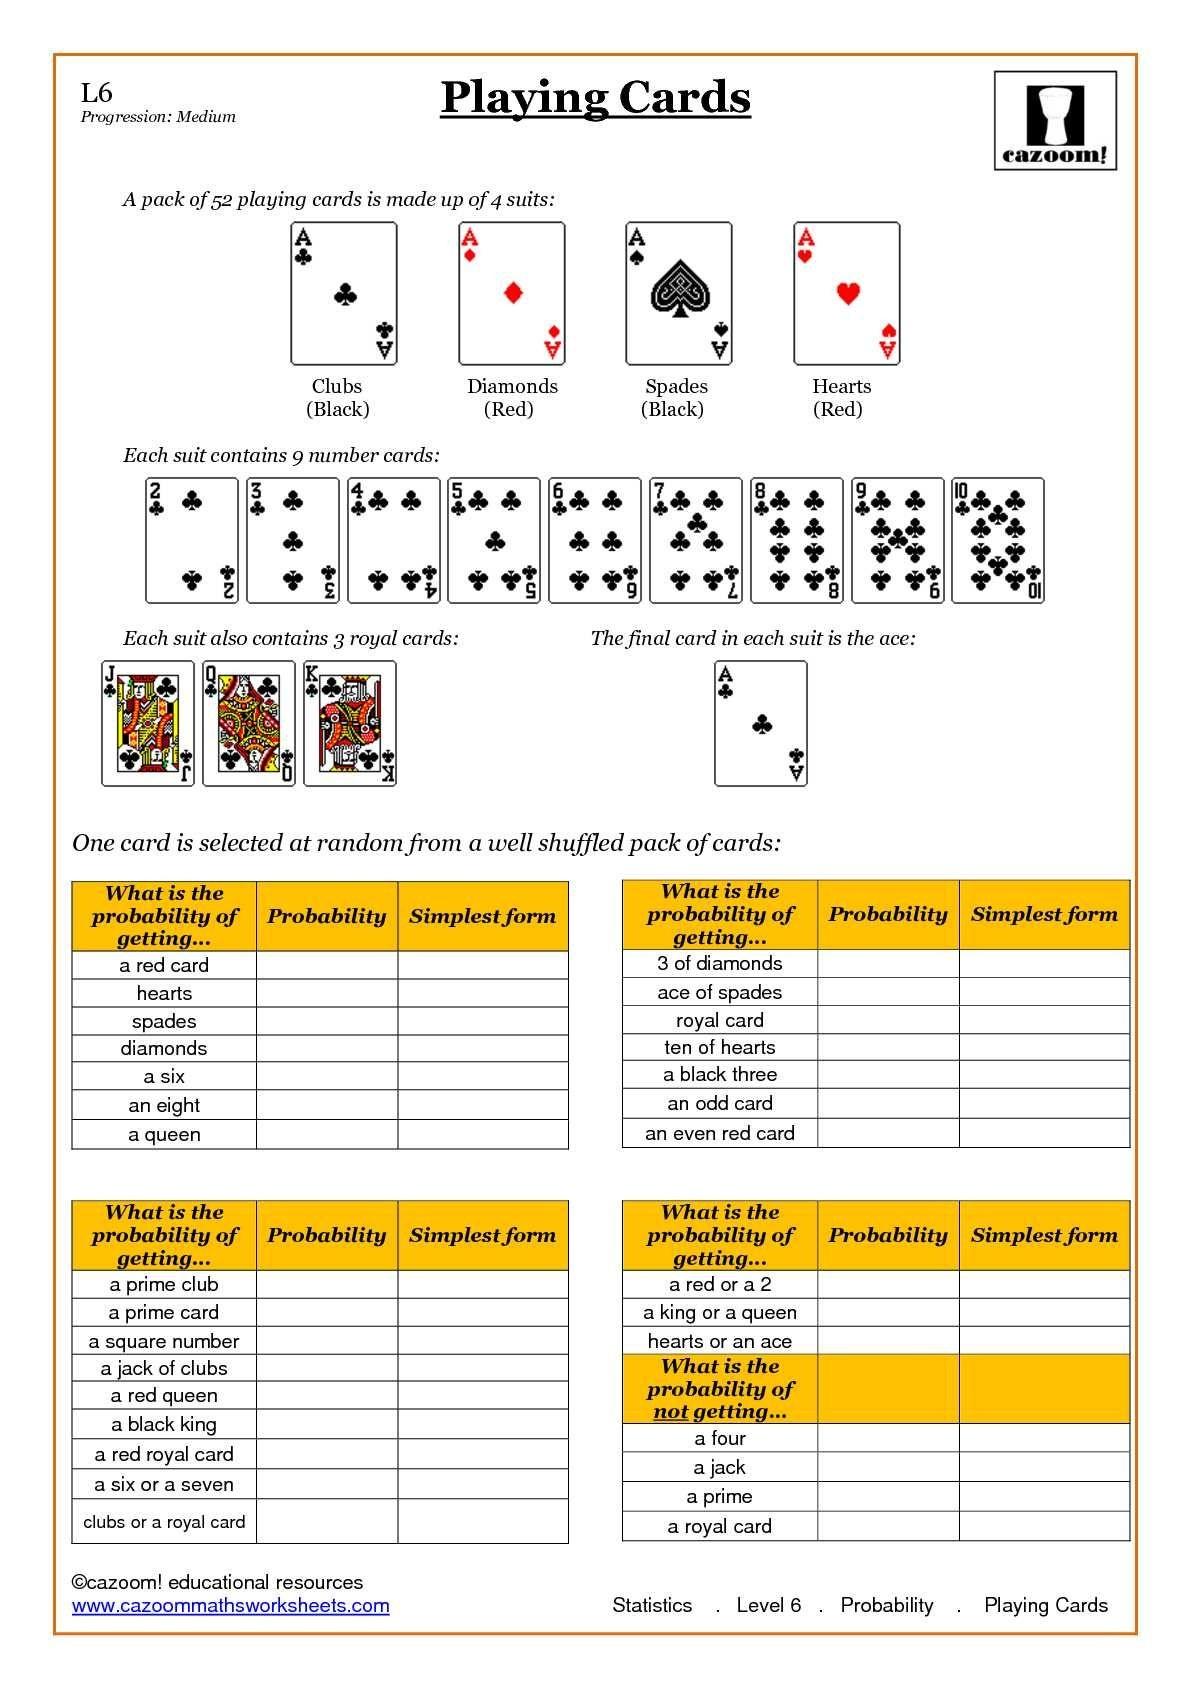 Statistic Maths Worksheets | Math | Probability Worksheets, Math - Free Printable Statistics Worksheets